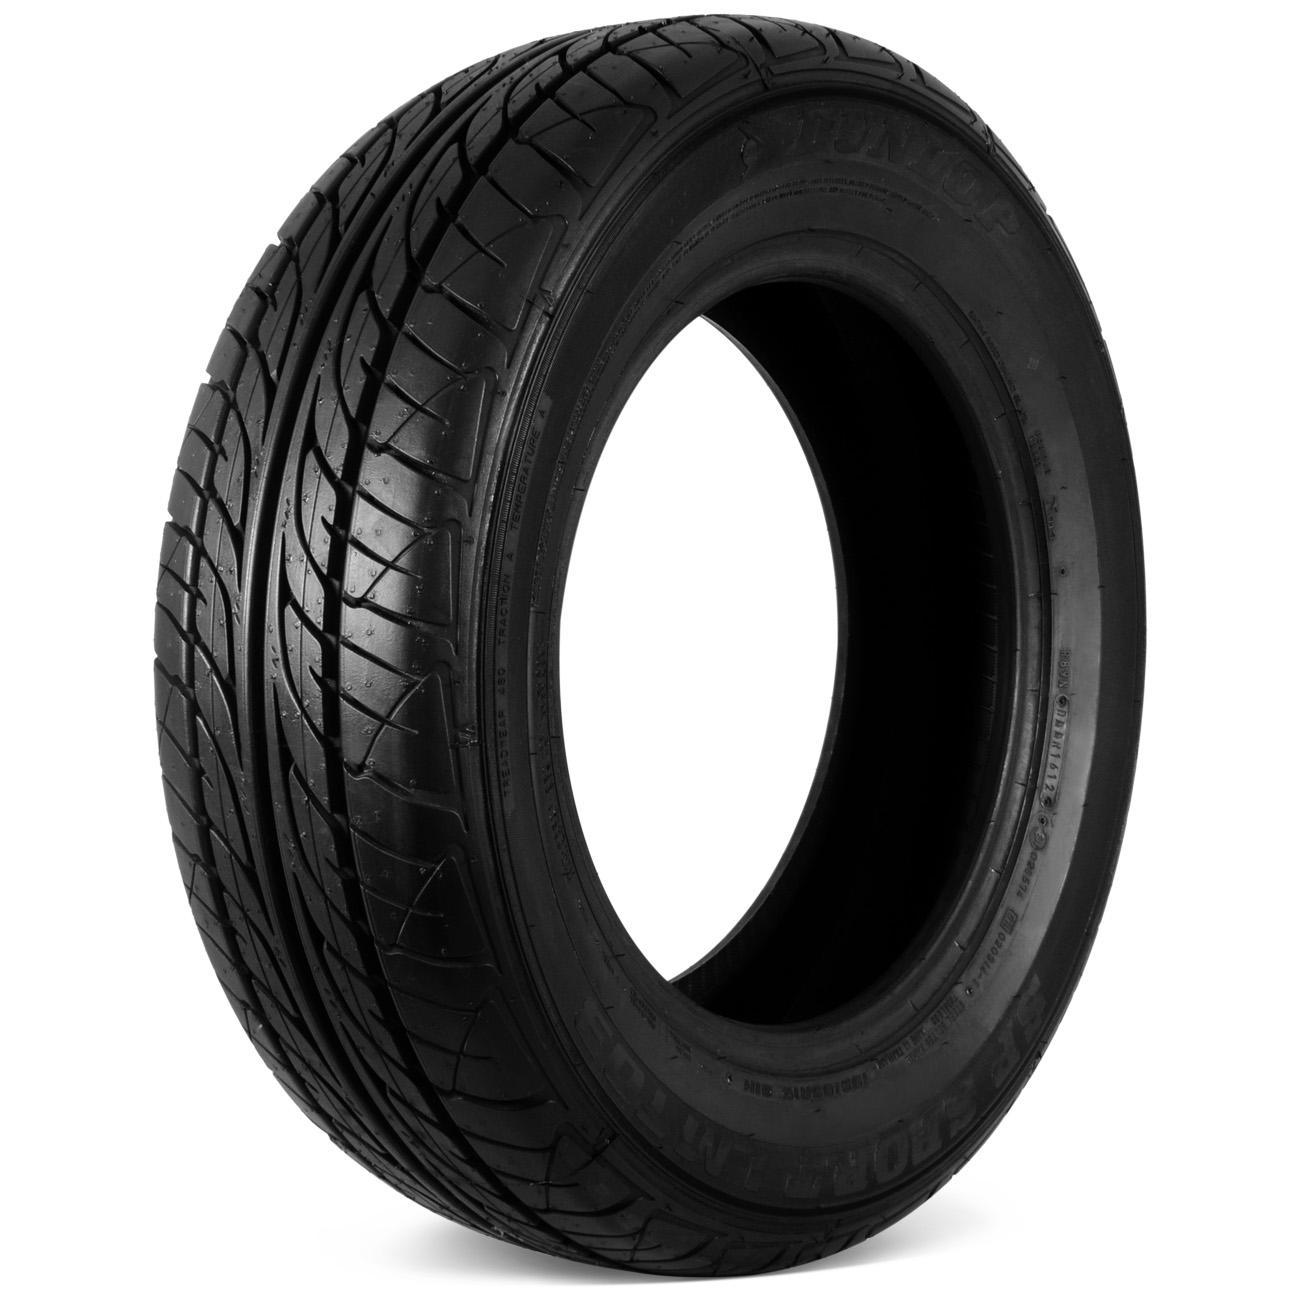 pneu dunlop 195 65r15 91h aro 15 sport lm 704 carro dunlop pneus carros aro 15 magazine luiza. Black Bedroom Furniture Sets. Home Design Ideas